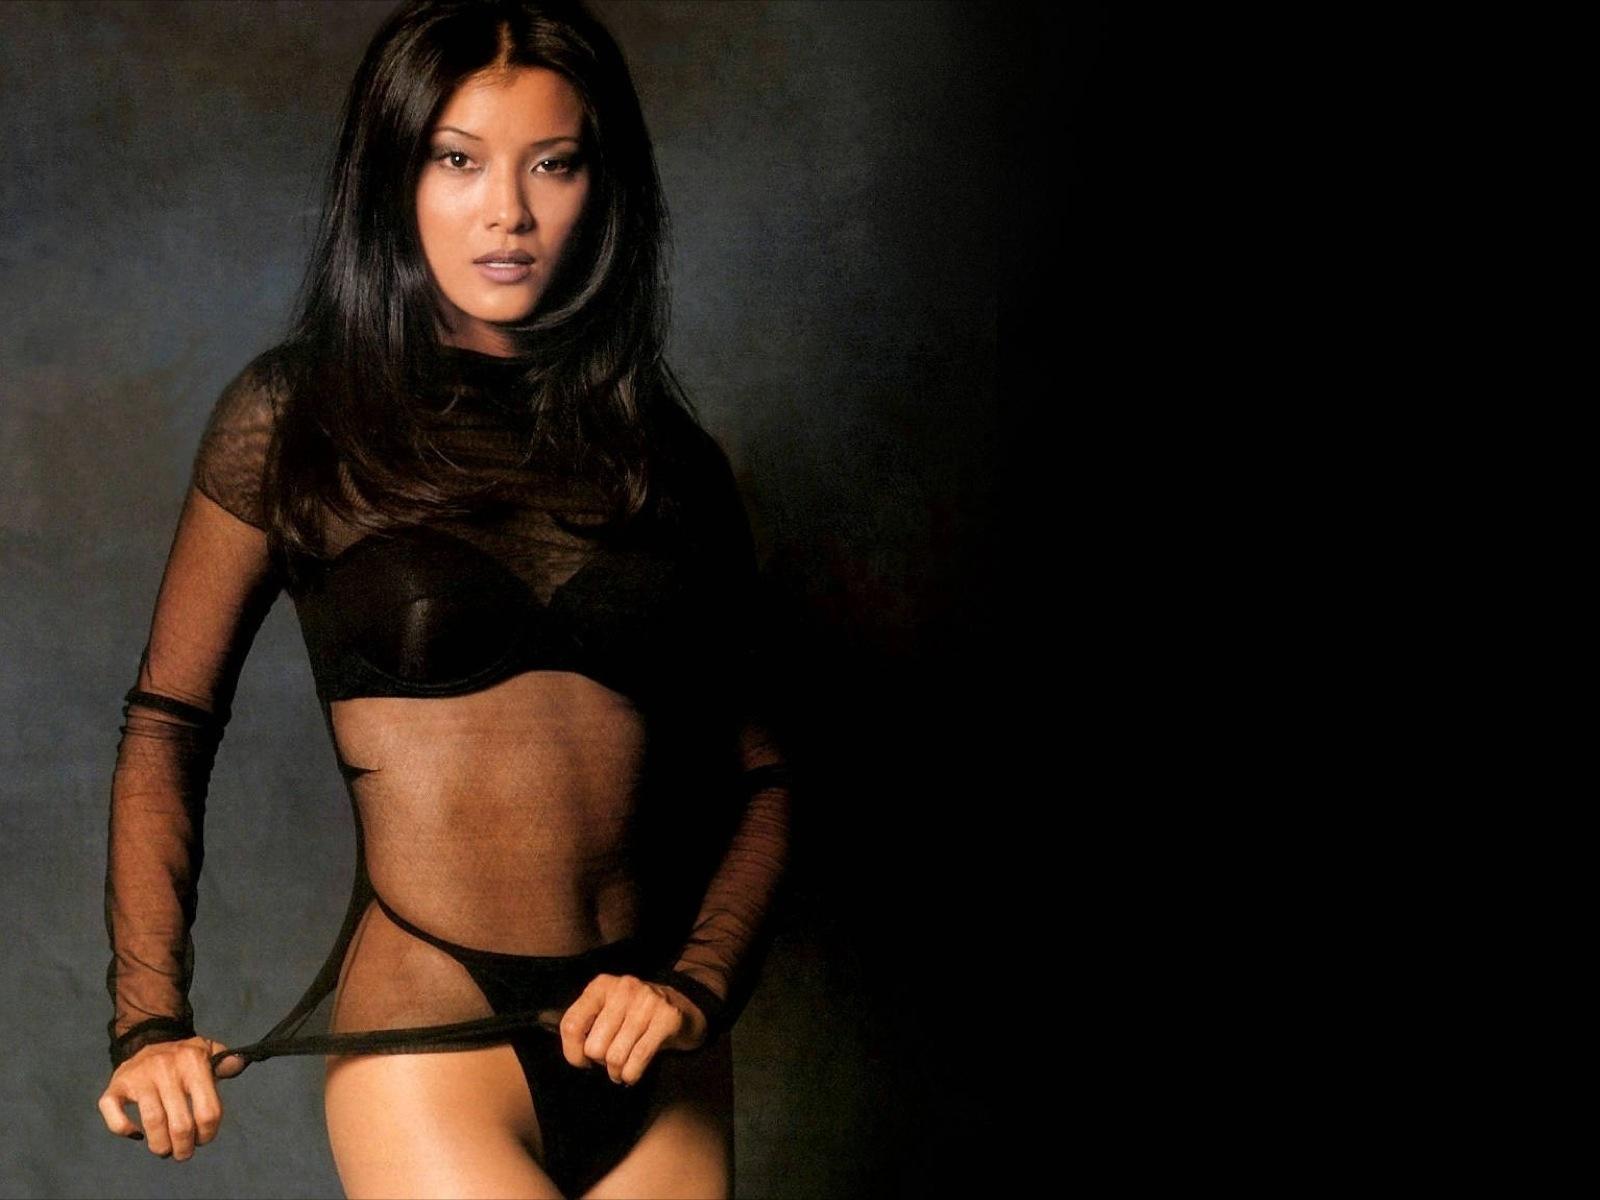 Hot Kelly Hu nudes (95 photos), Pussy, Leaked, Feet, panties 2006